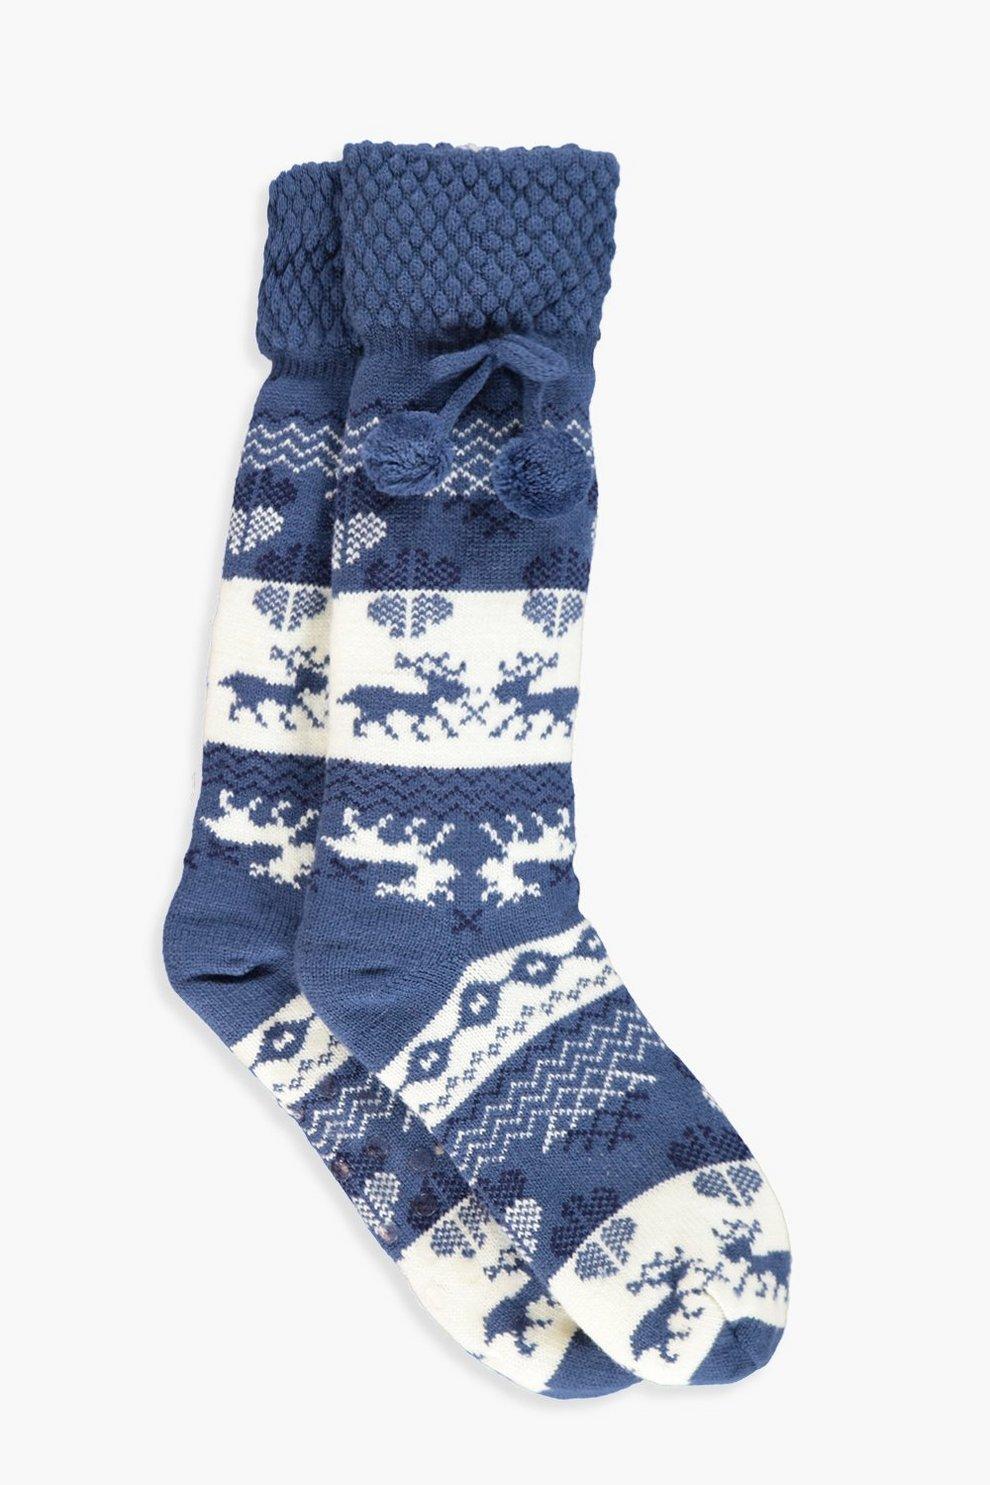 Ava Chunky Knitted Fairisle Fleece Lined Socks Boohoo